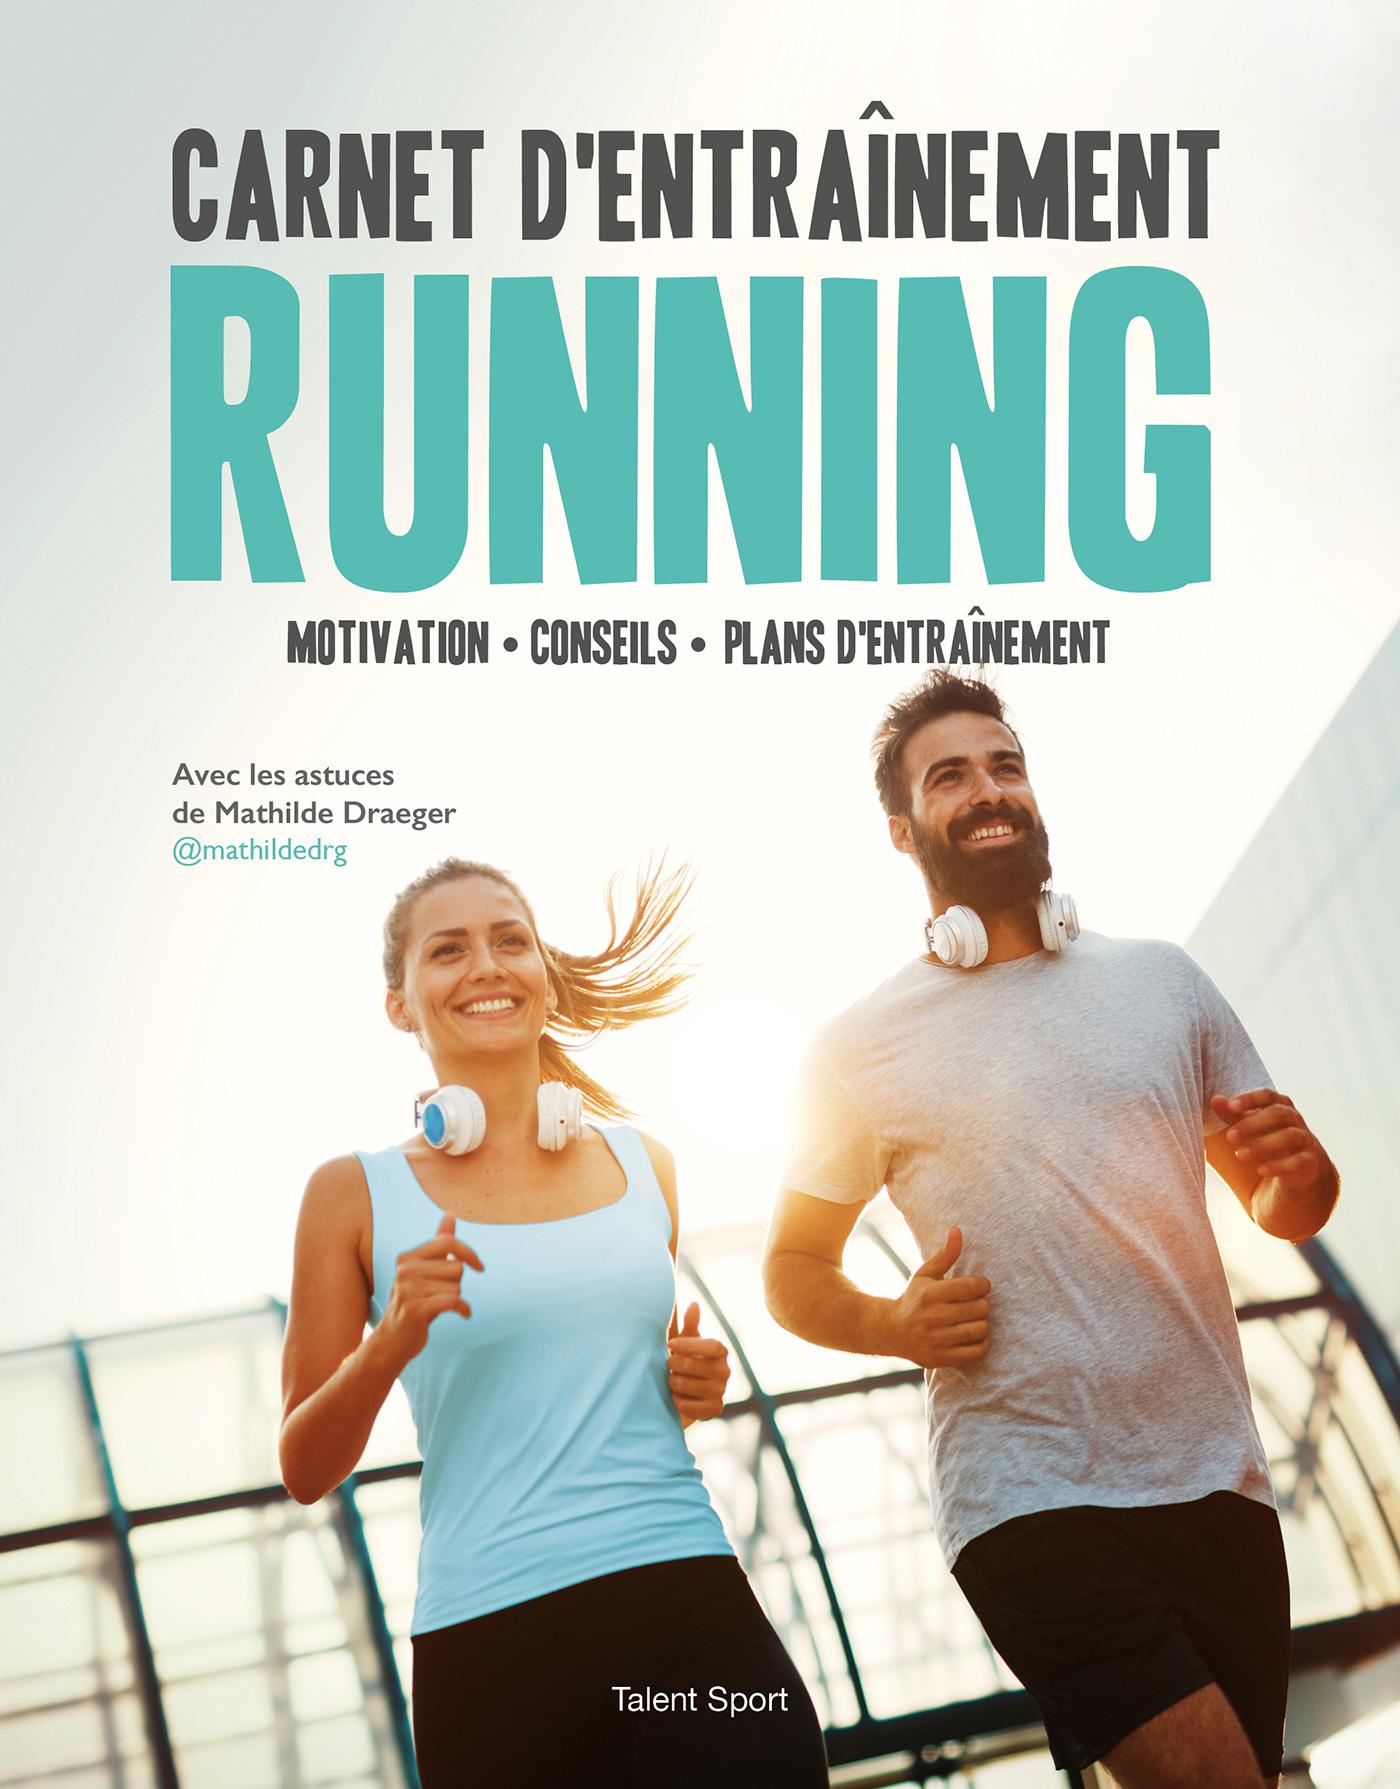 CARNET D'ENTRAINEMENT RUNNING